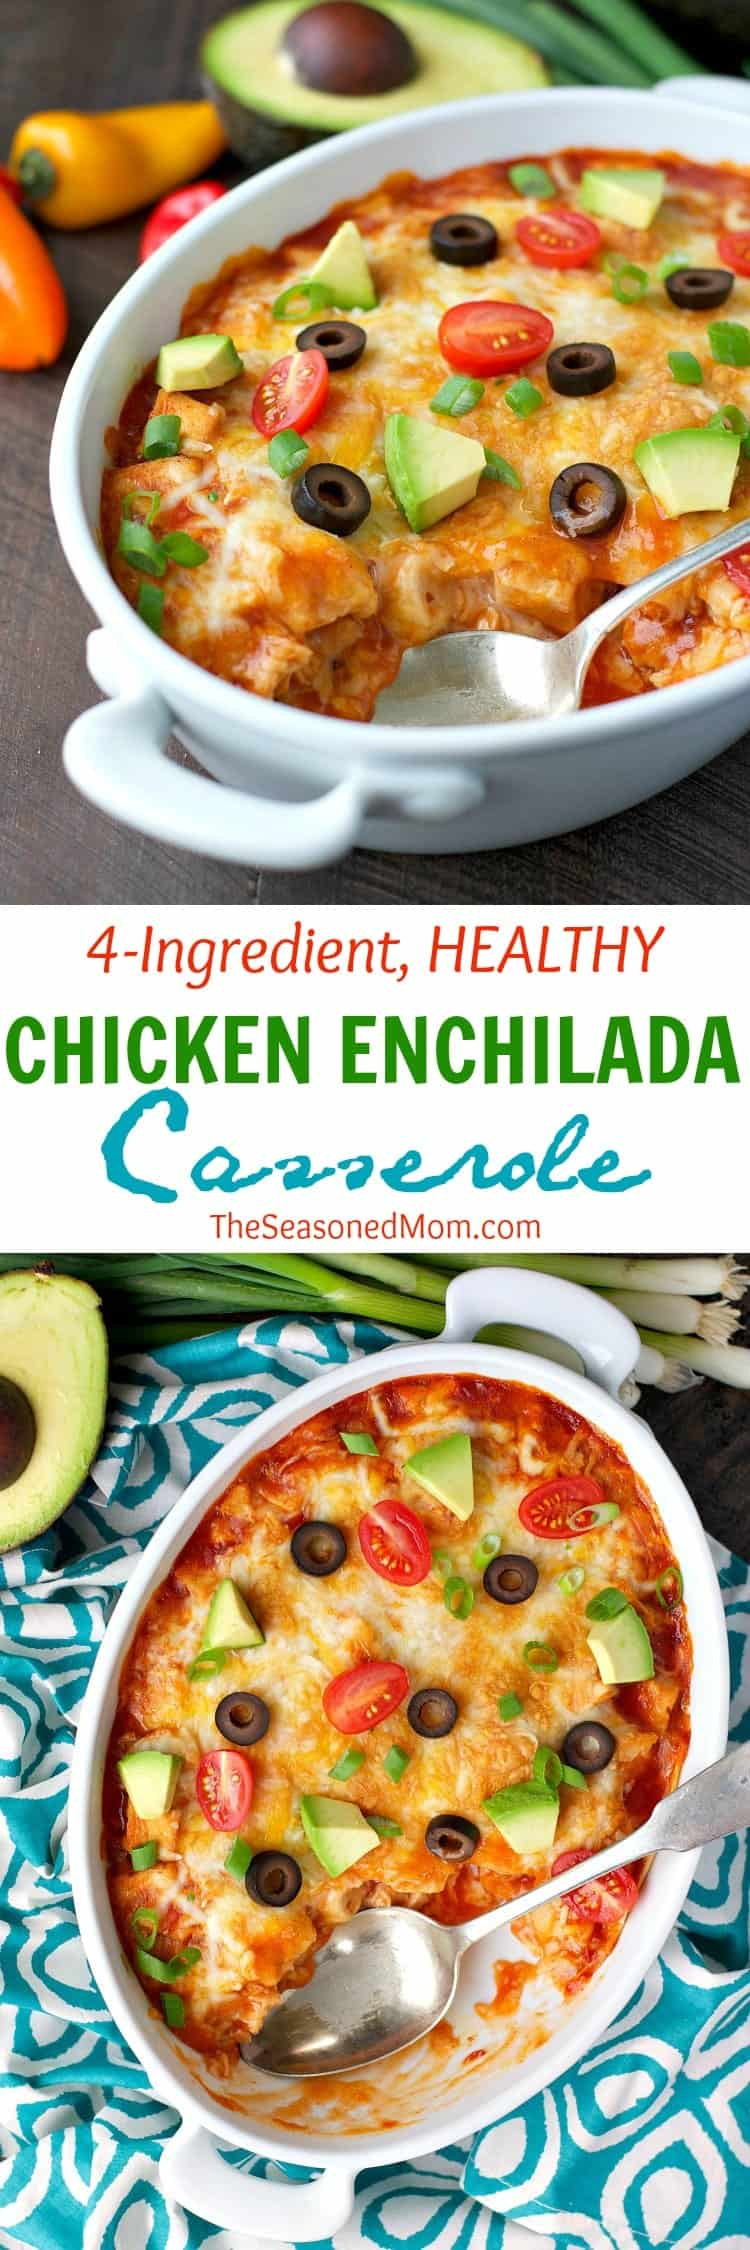 4 Ingredient Healthy Chicken Enchilada Casserole The Seasoned Mom